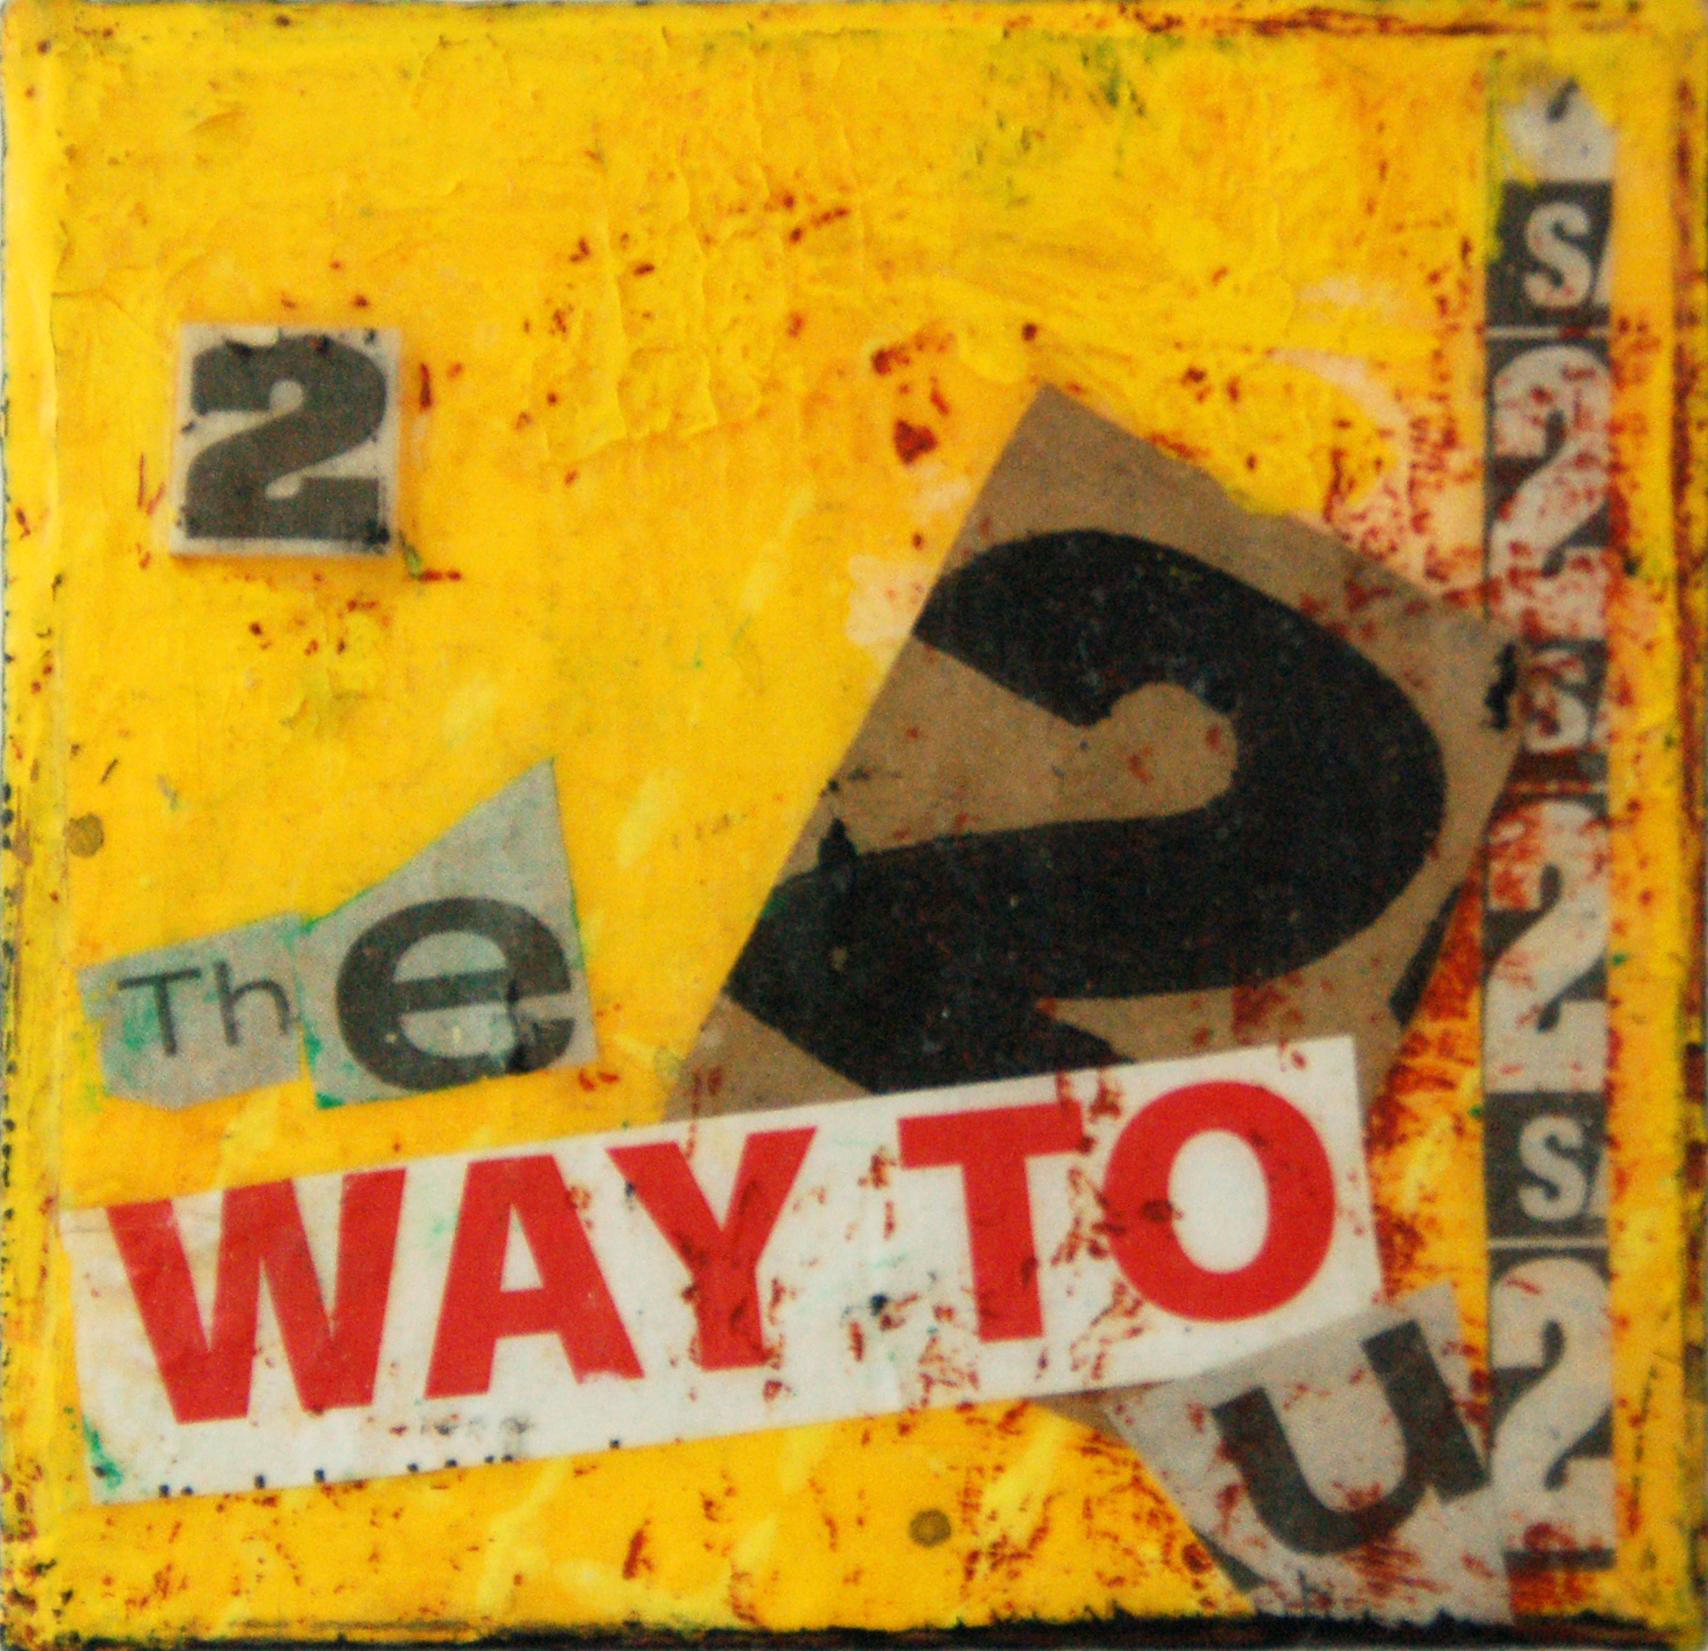 THE WAY 2 U